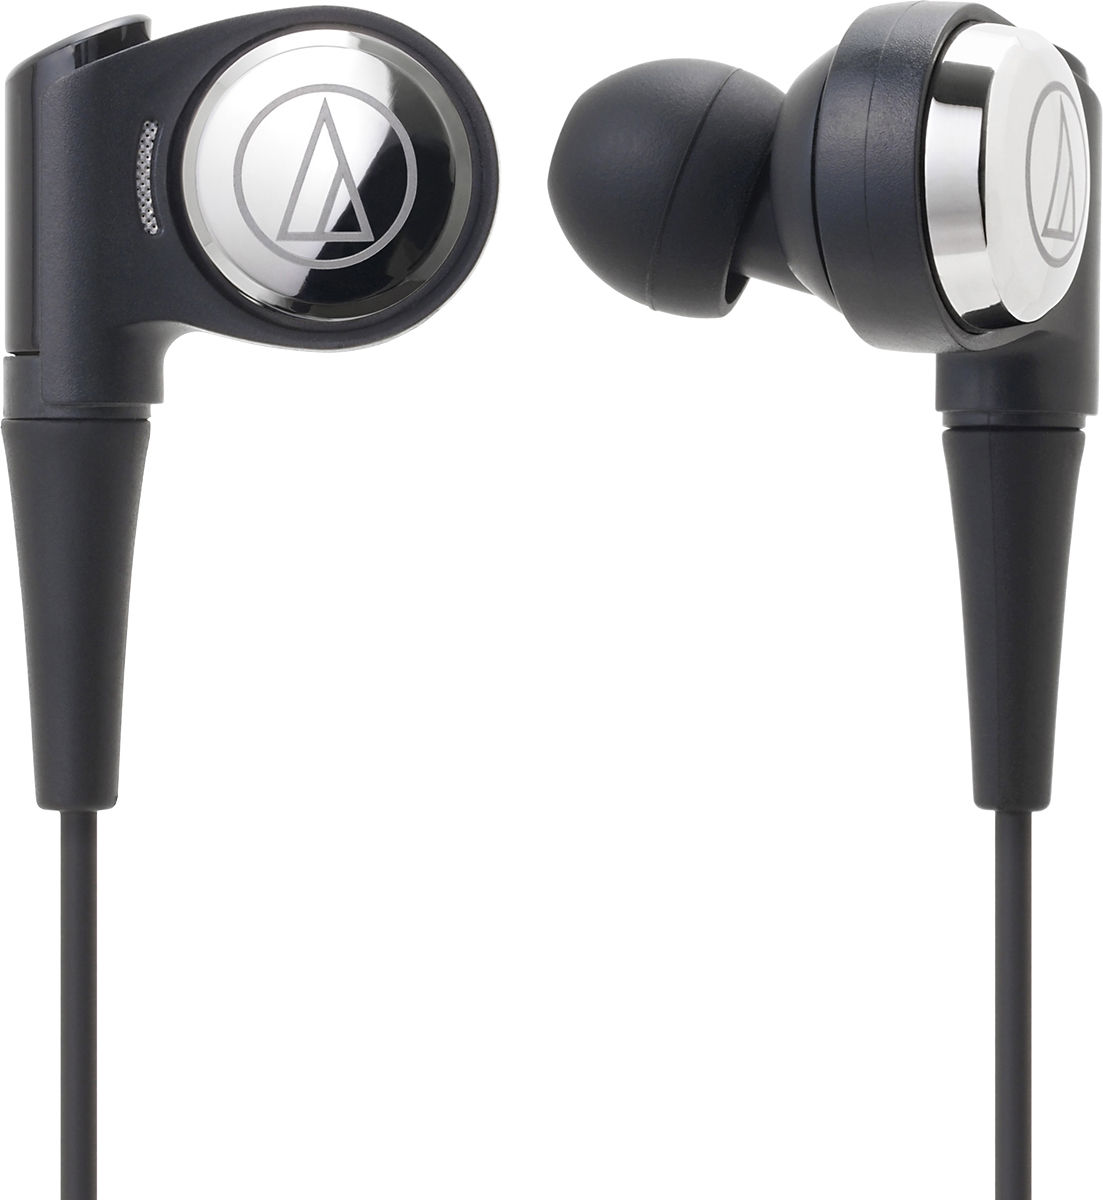 audio-technica-ath-ckr10_p_1200